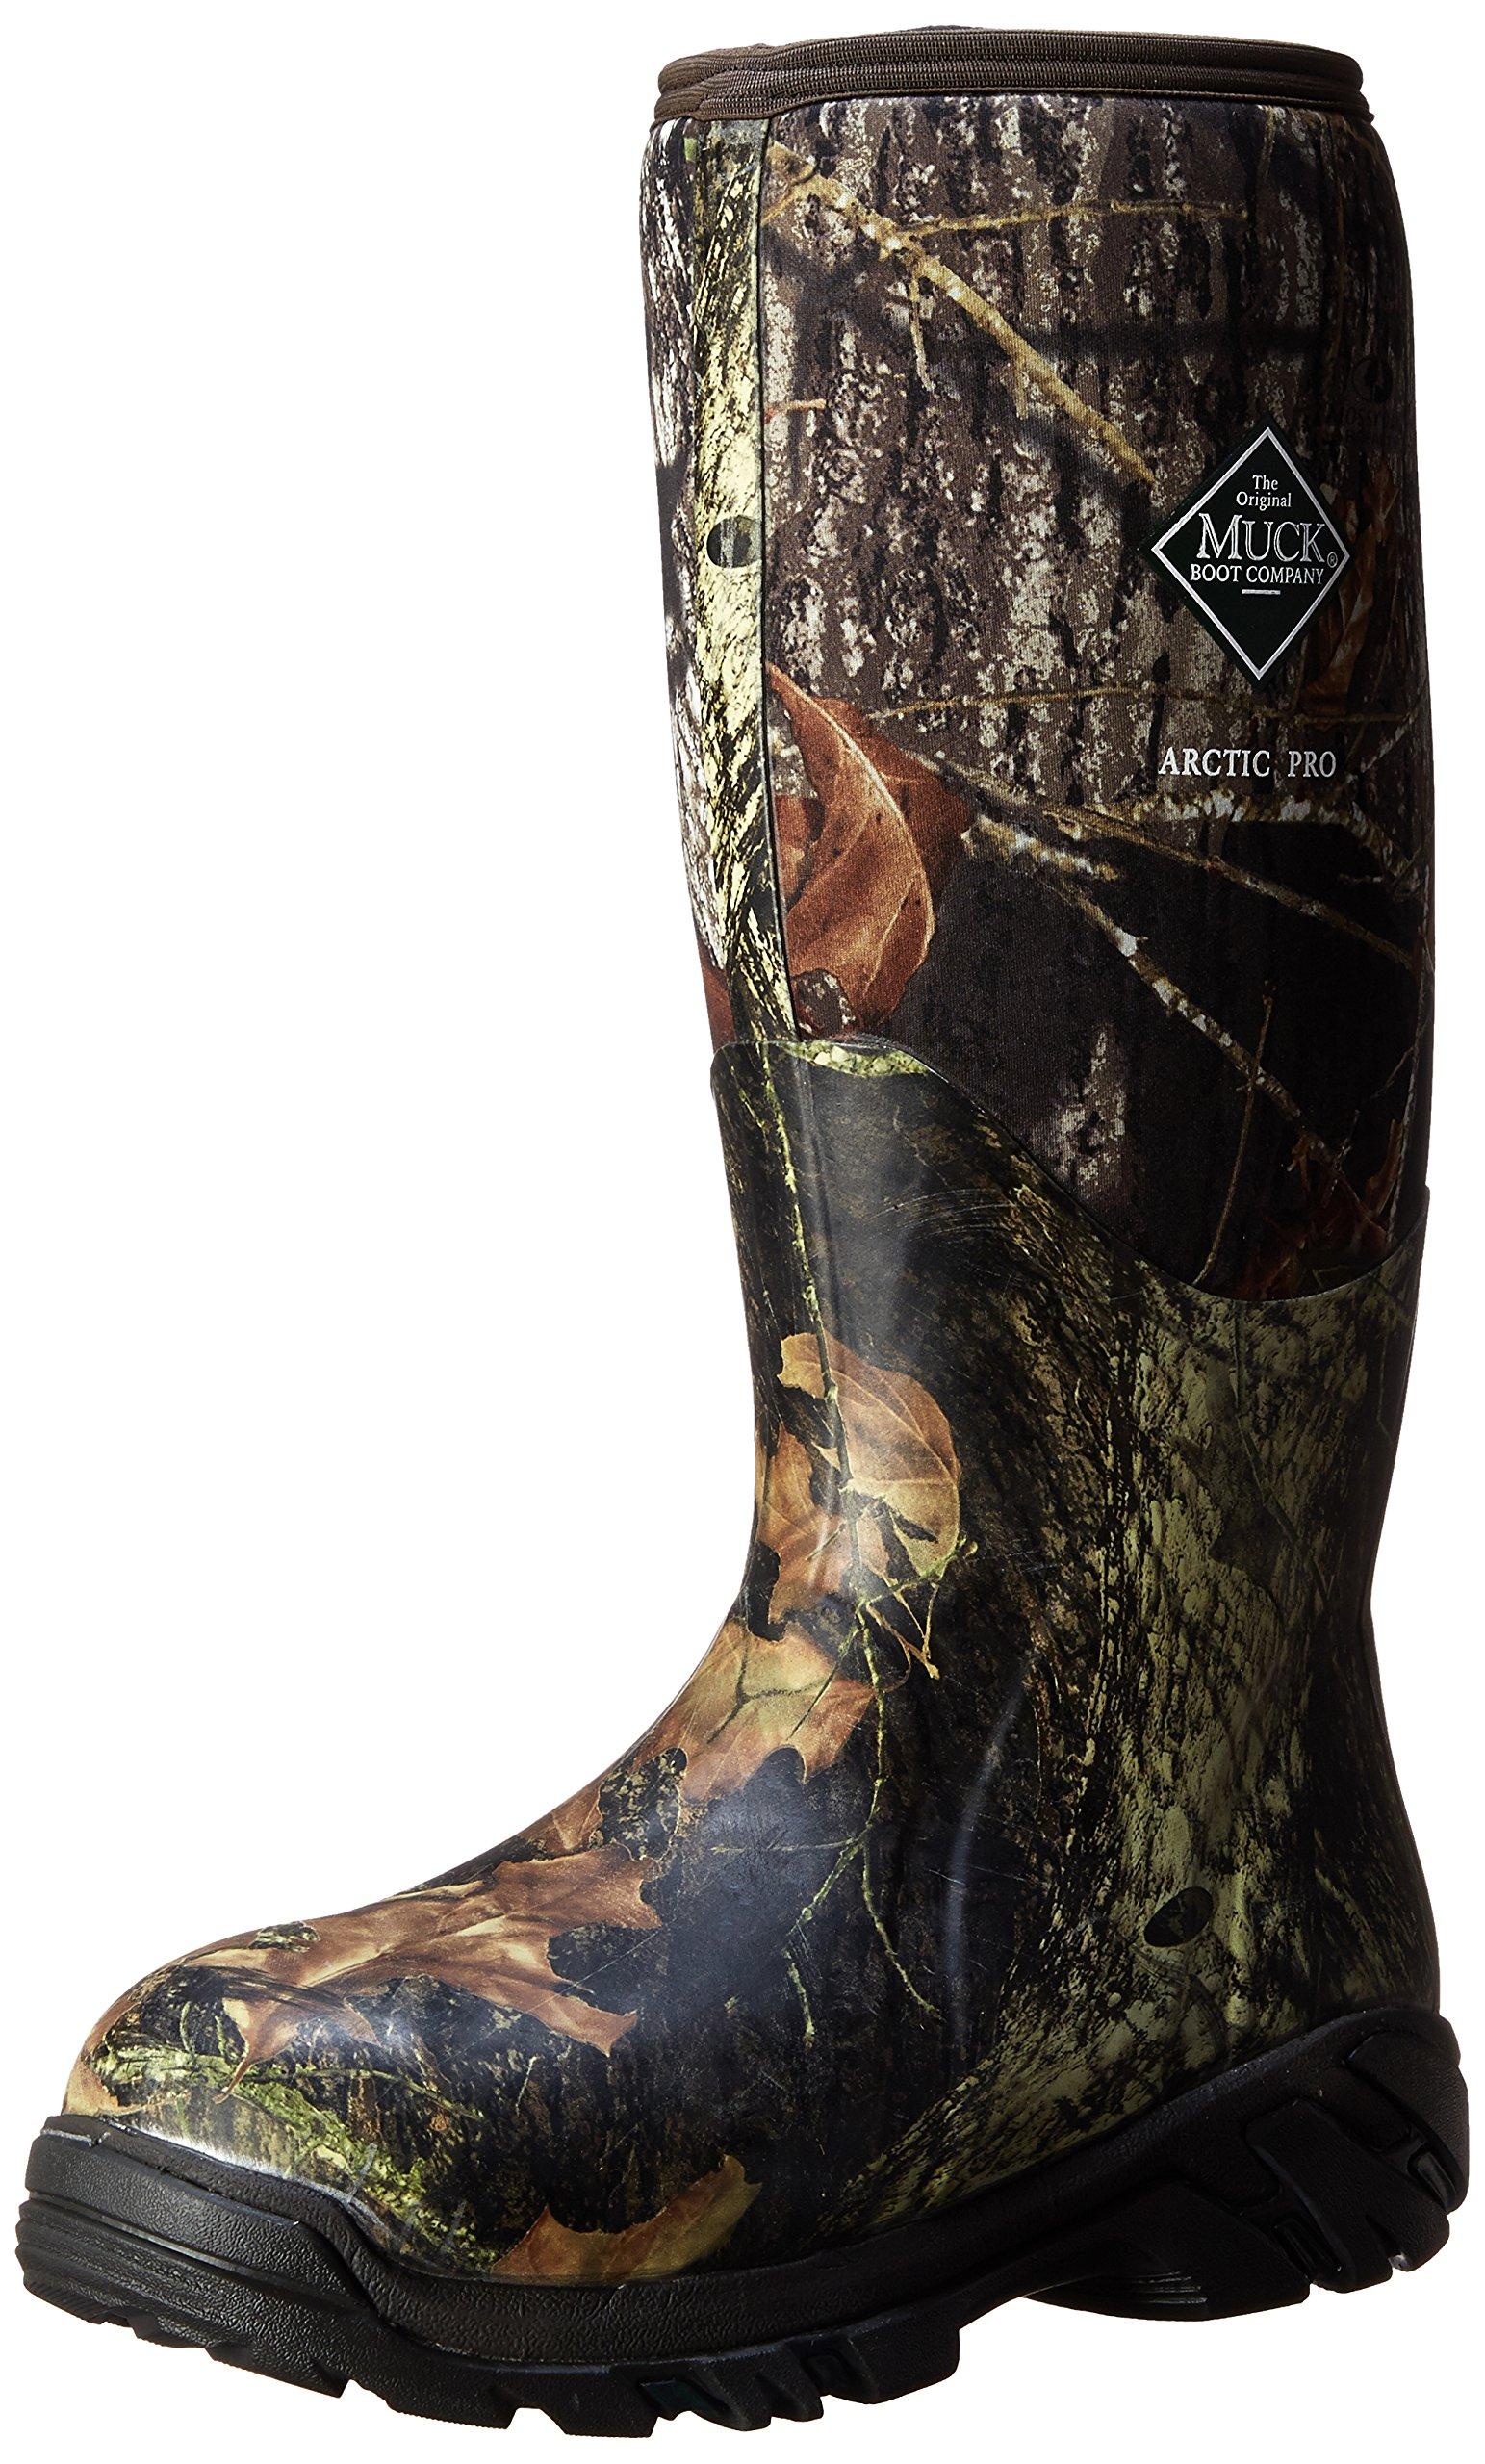 Muck Boots Arctic Pro Camo Mossy Oak - Men's 9.0, Women's 10.0 B(M) US by Muck Boot